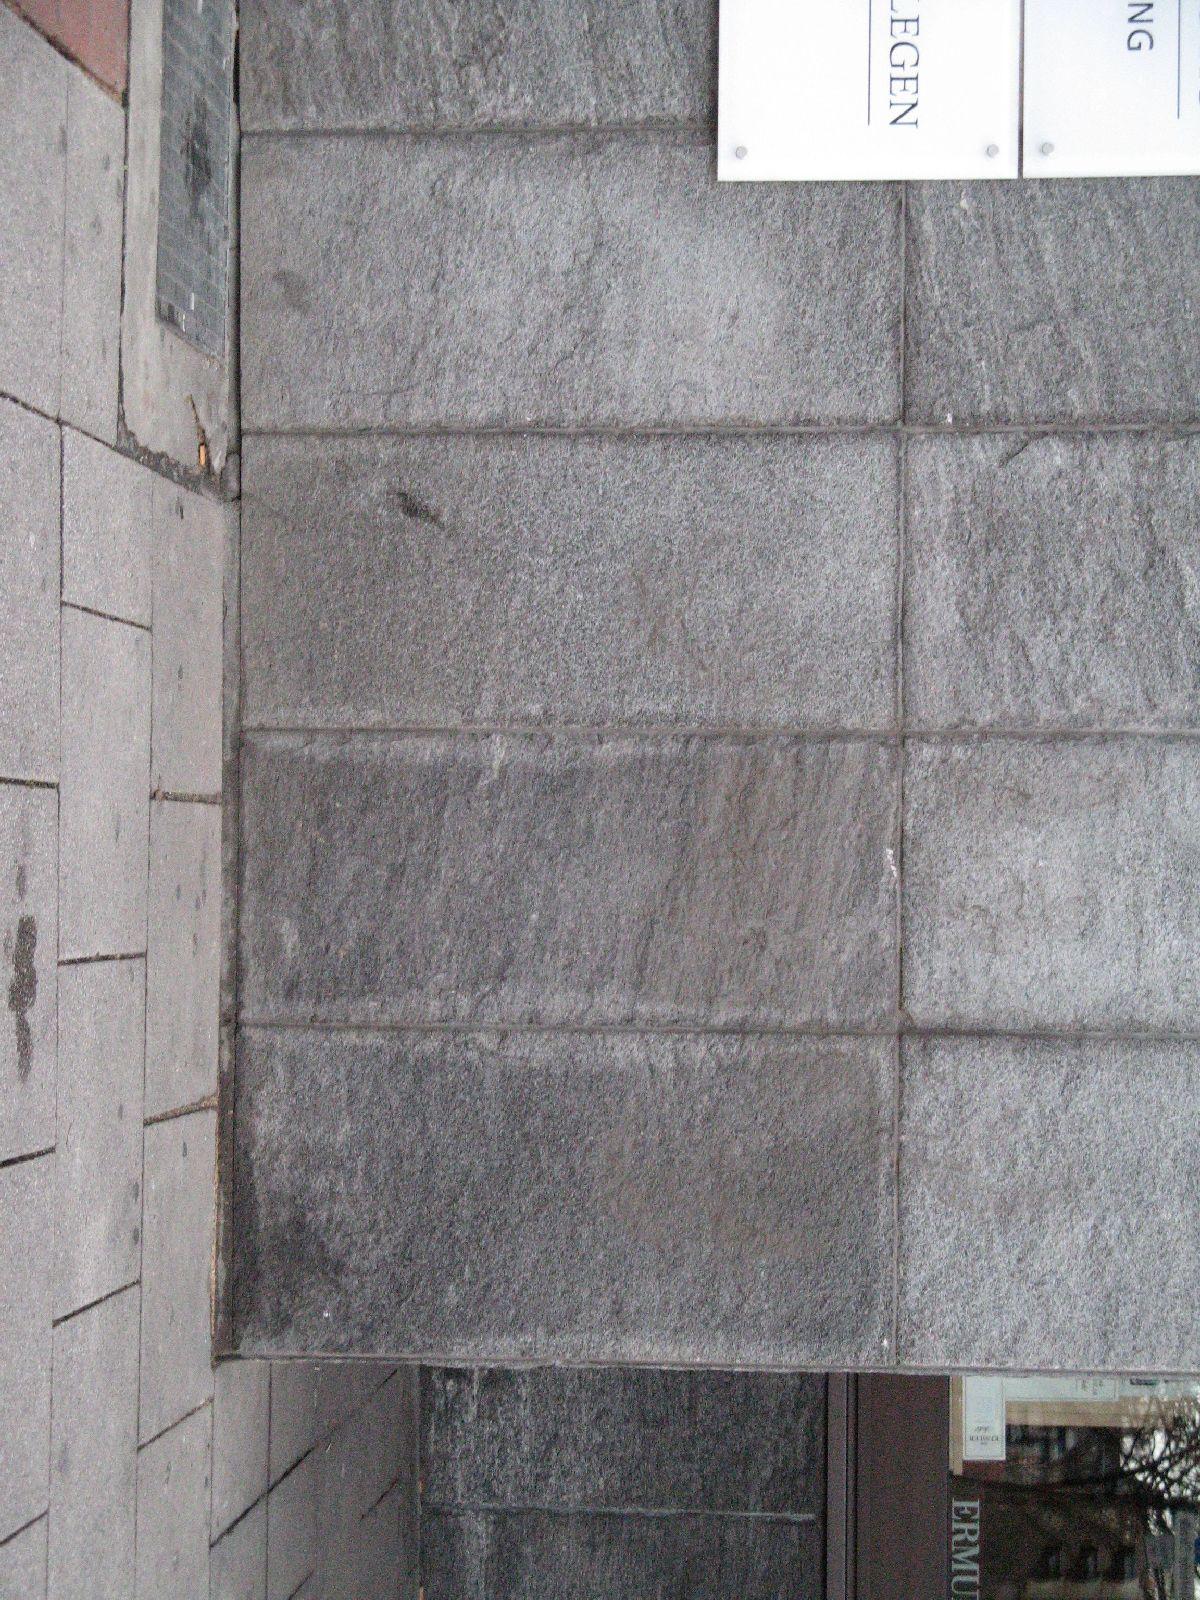 Gebaeude-Architektur_Textur_B_04048